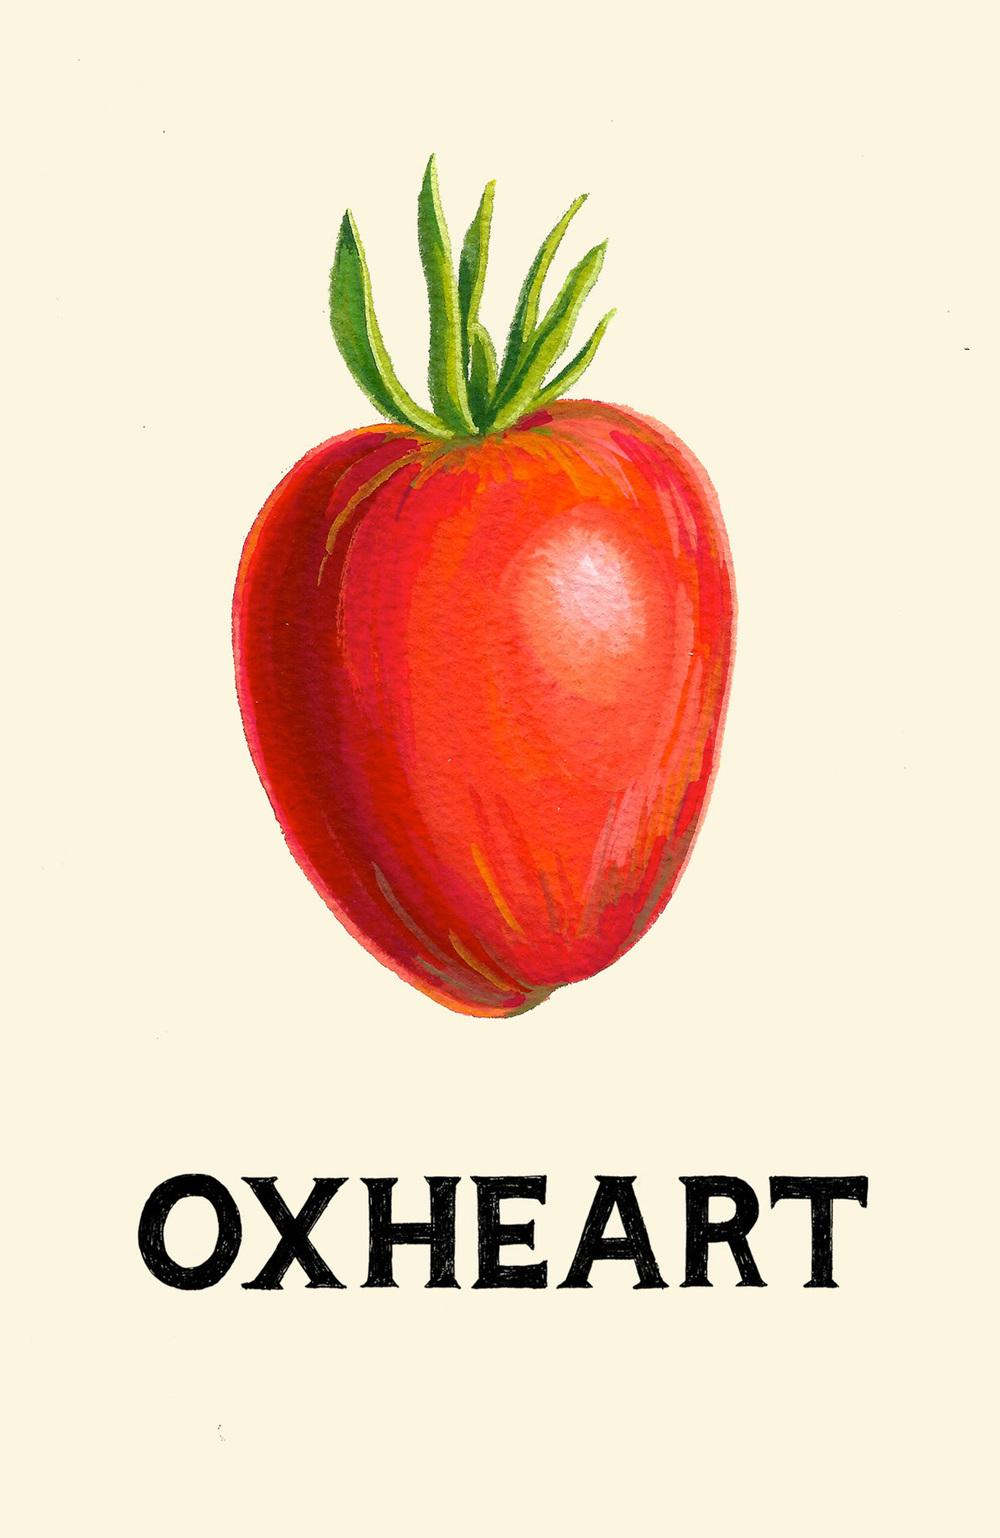 oxheartpc.jpg